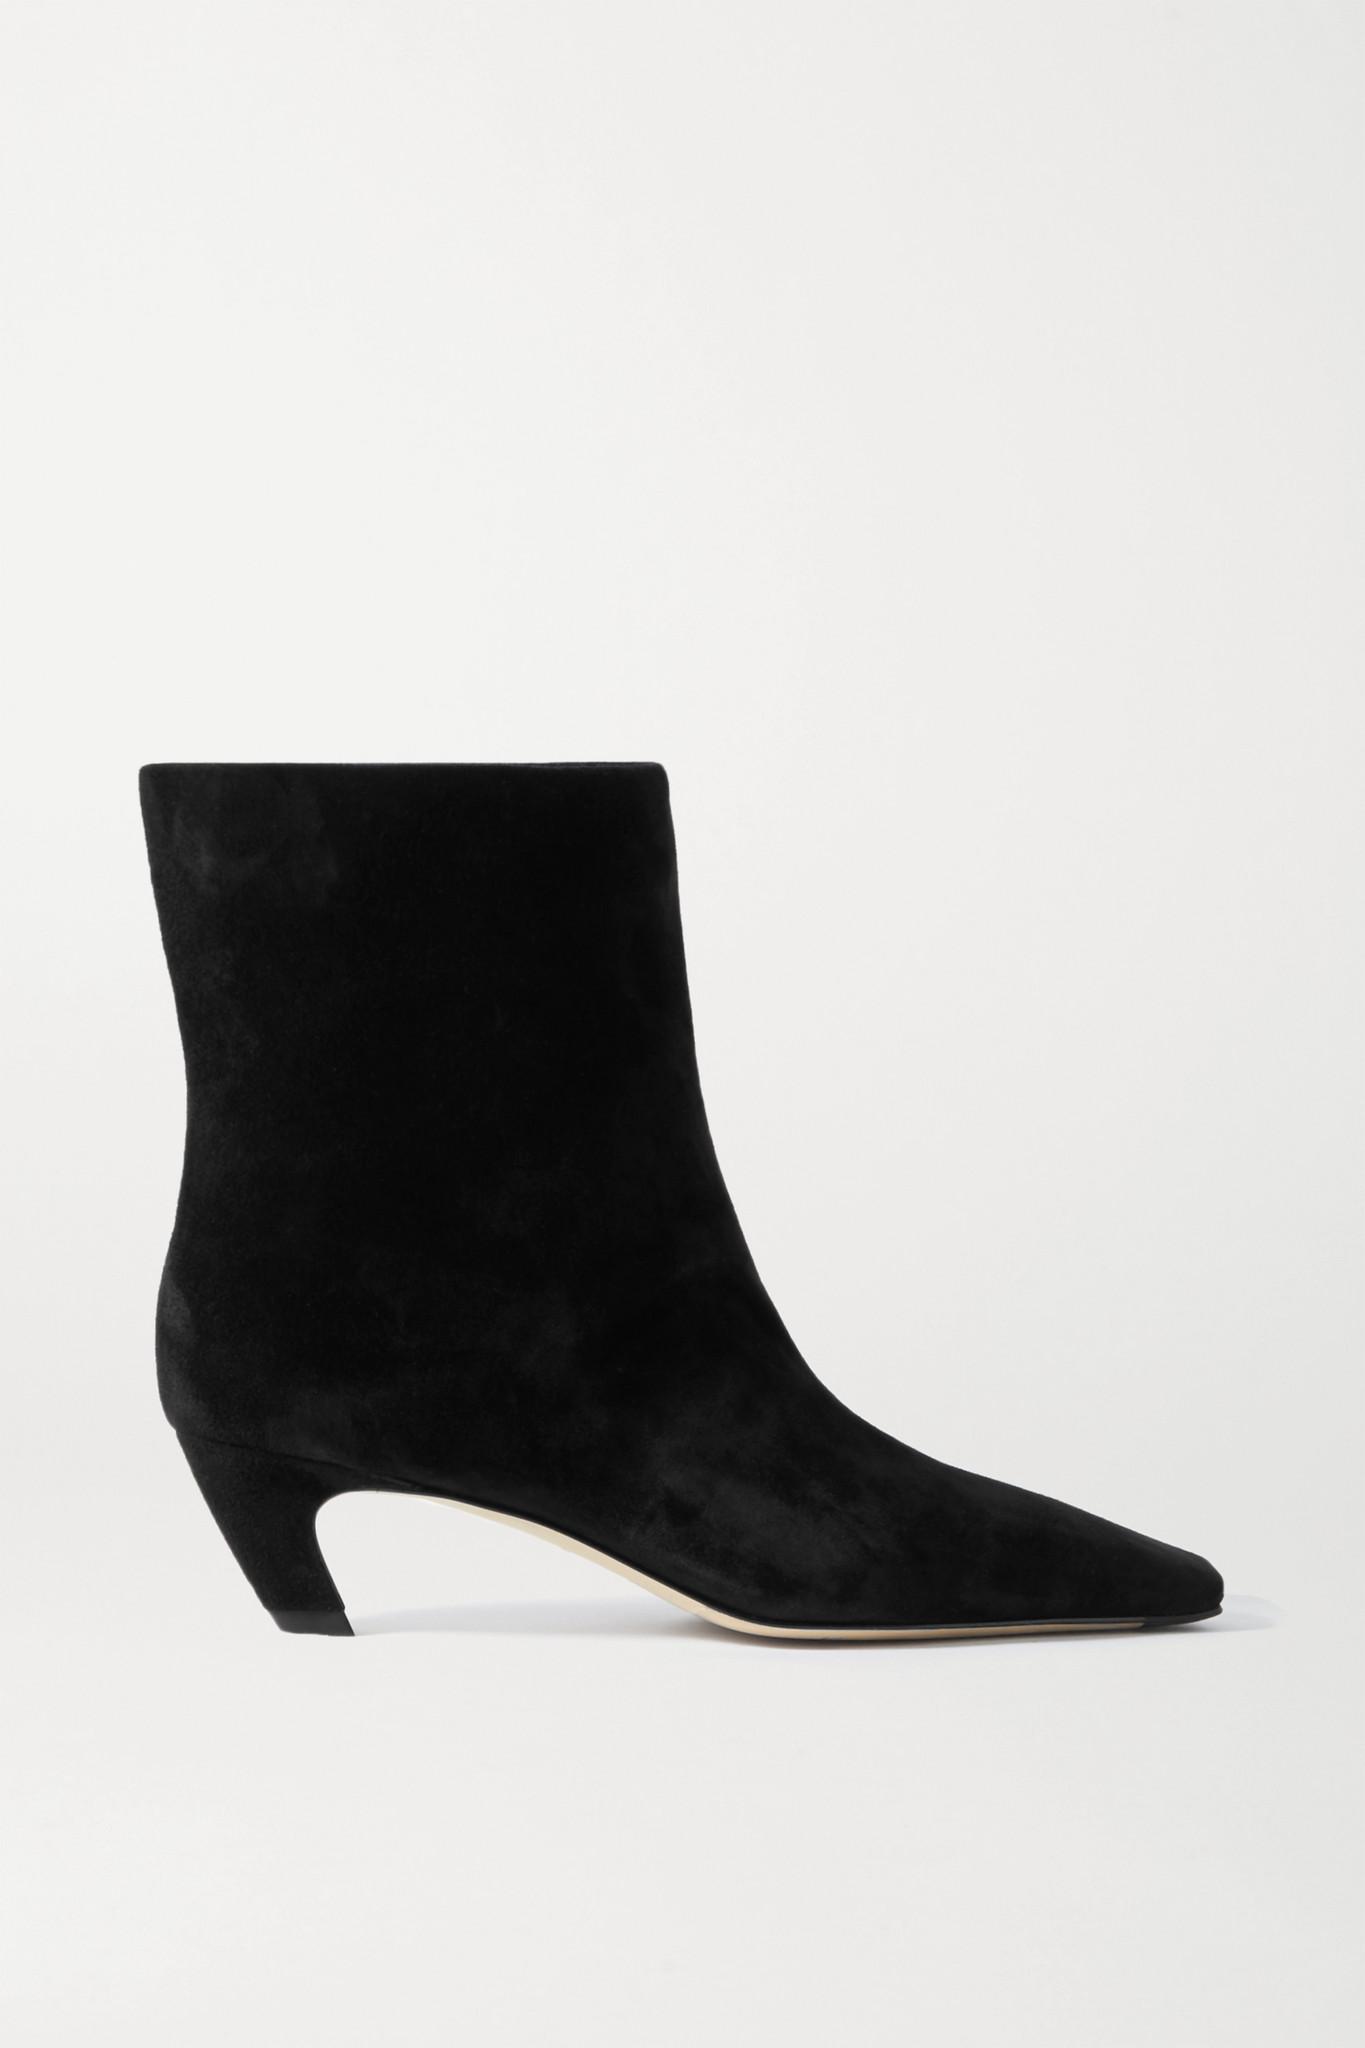 KHAITE - Arizona 绒面革踝靴 - 黑色 - IT38